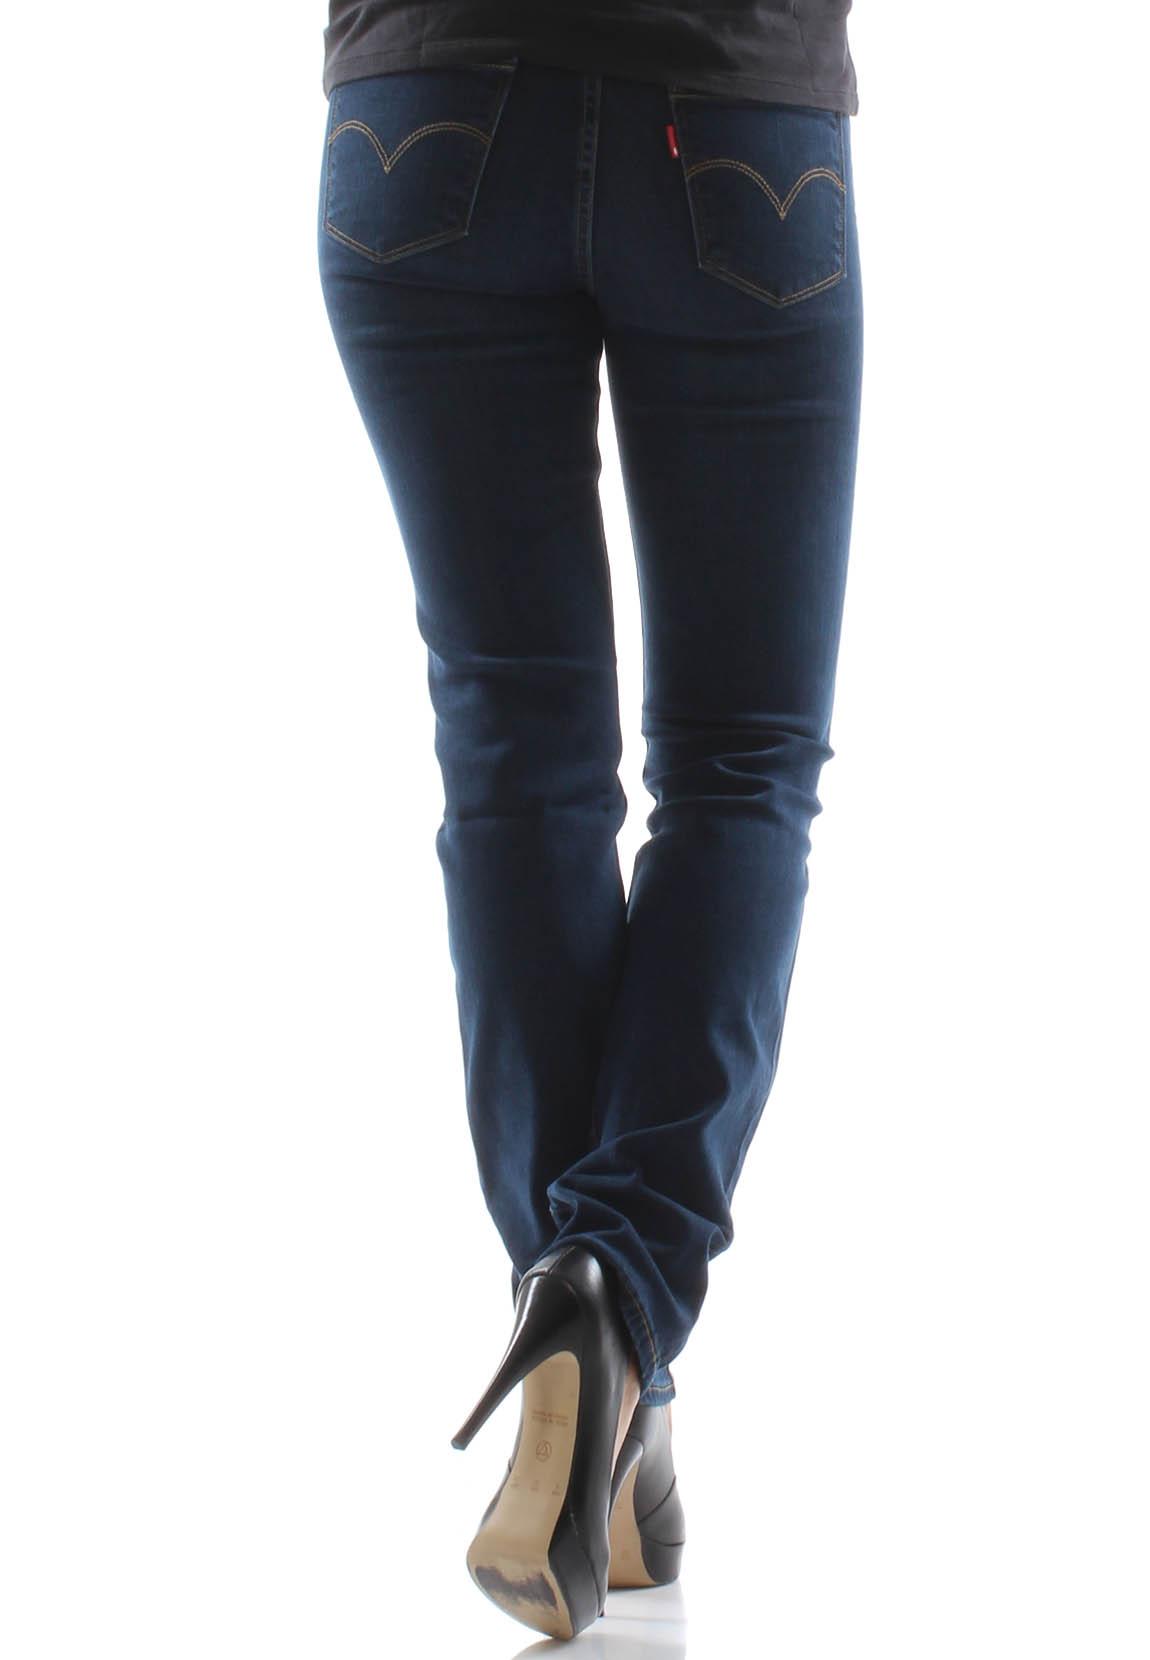 levis jeans women 712 slim 18884 0093 city blues ebay. Black Bedroom Furniture Sets. Home Design Ideas